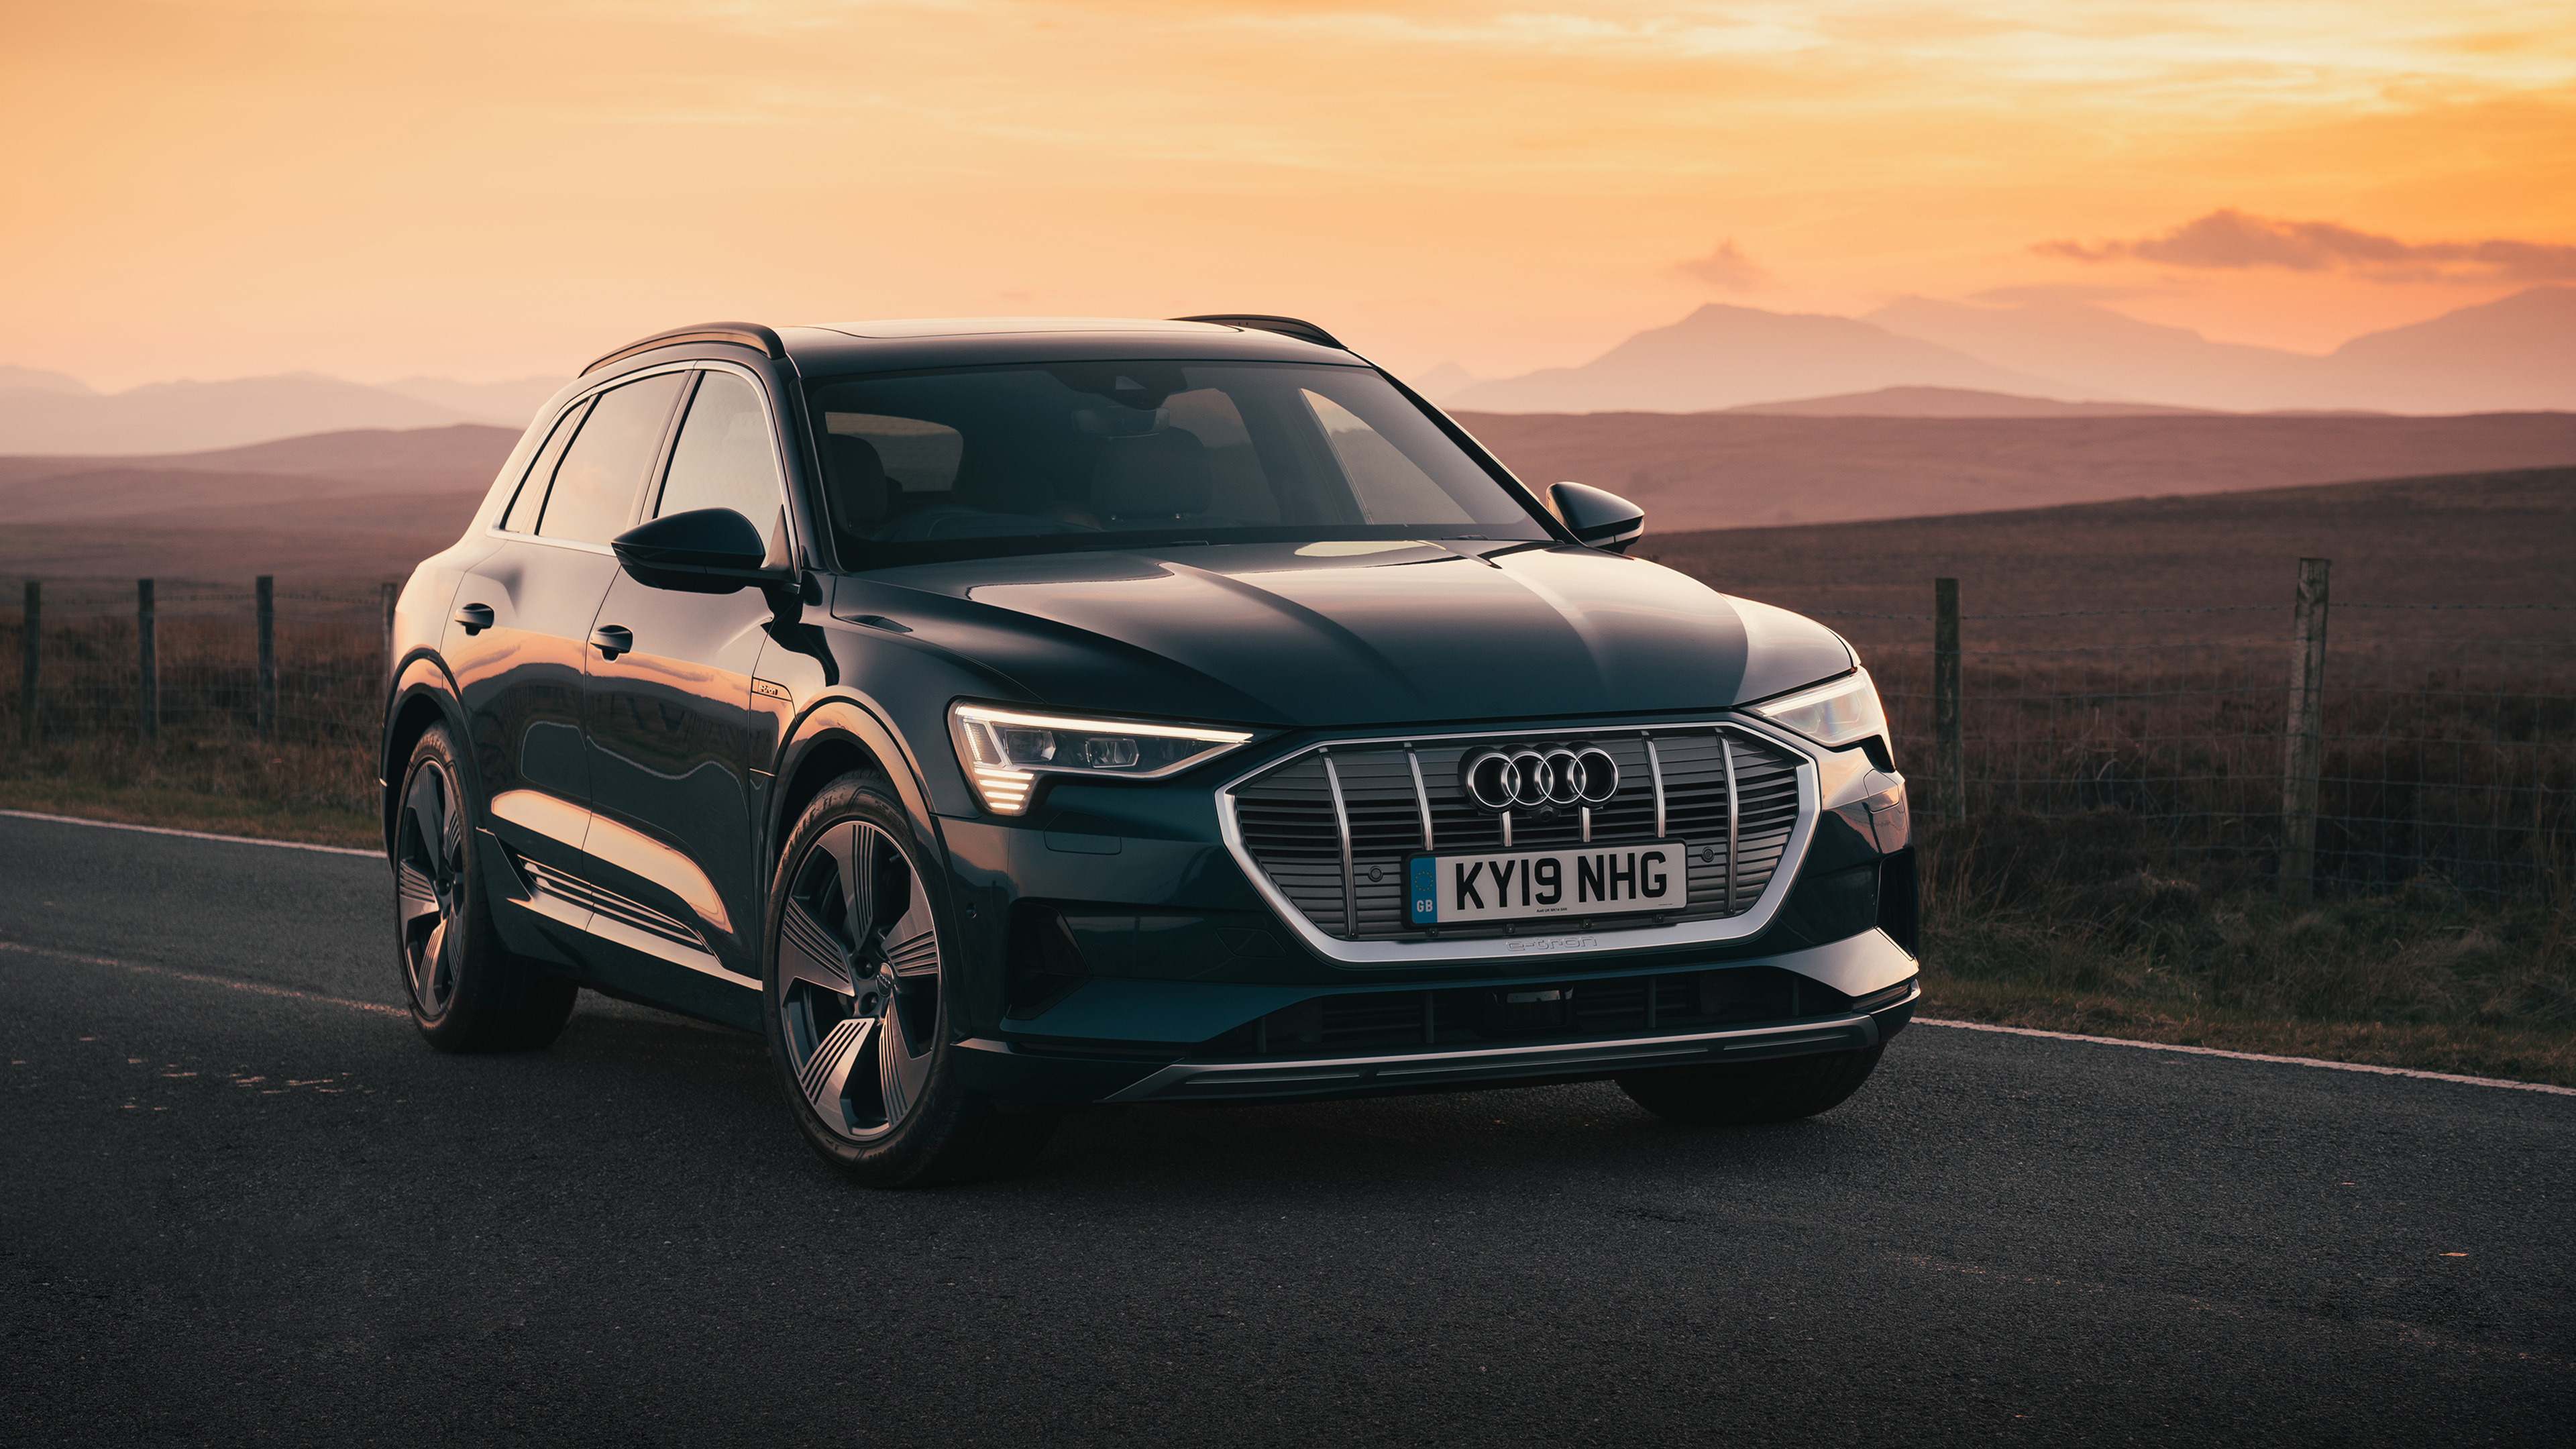 Audi E Tron 55 Quattro 2019 4k 2 Wallpaper Hd Car Wallpapers Id 12396